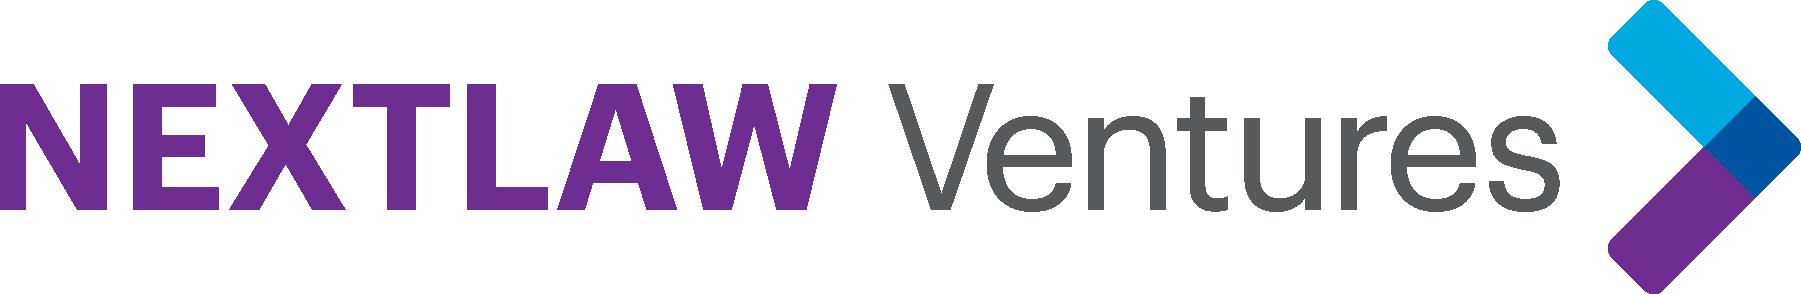 Nextlaw Ventures